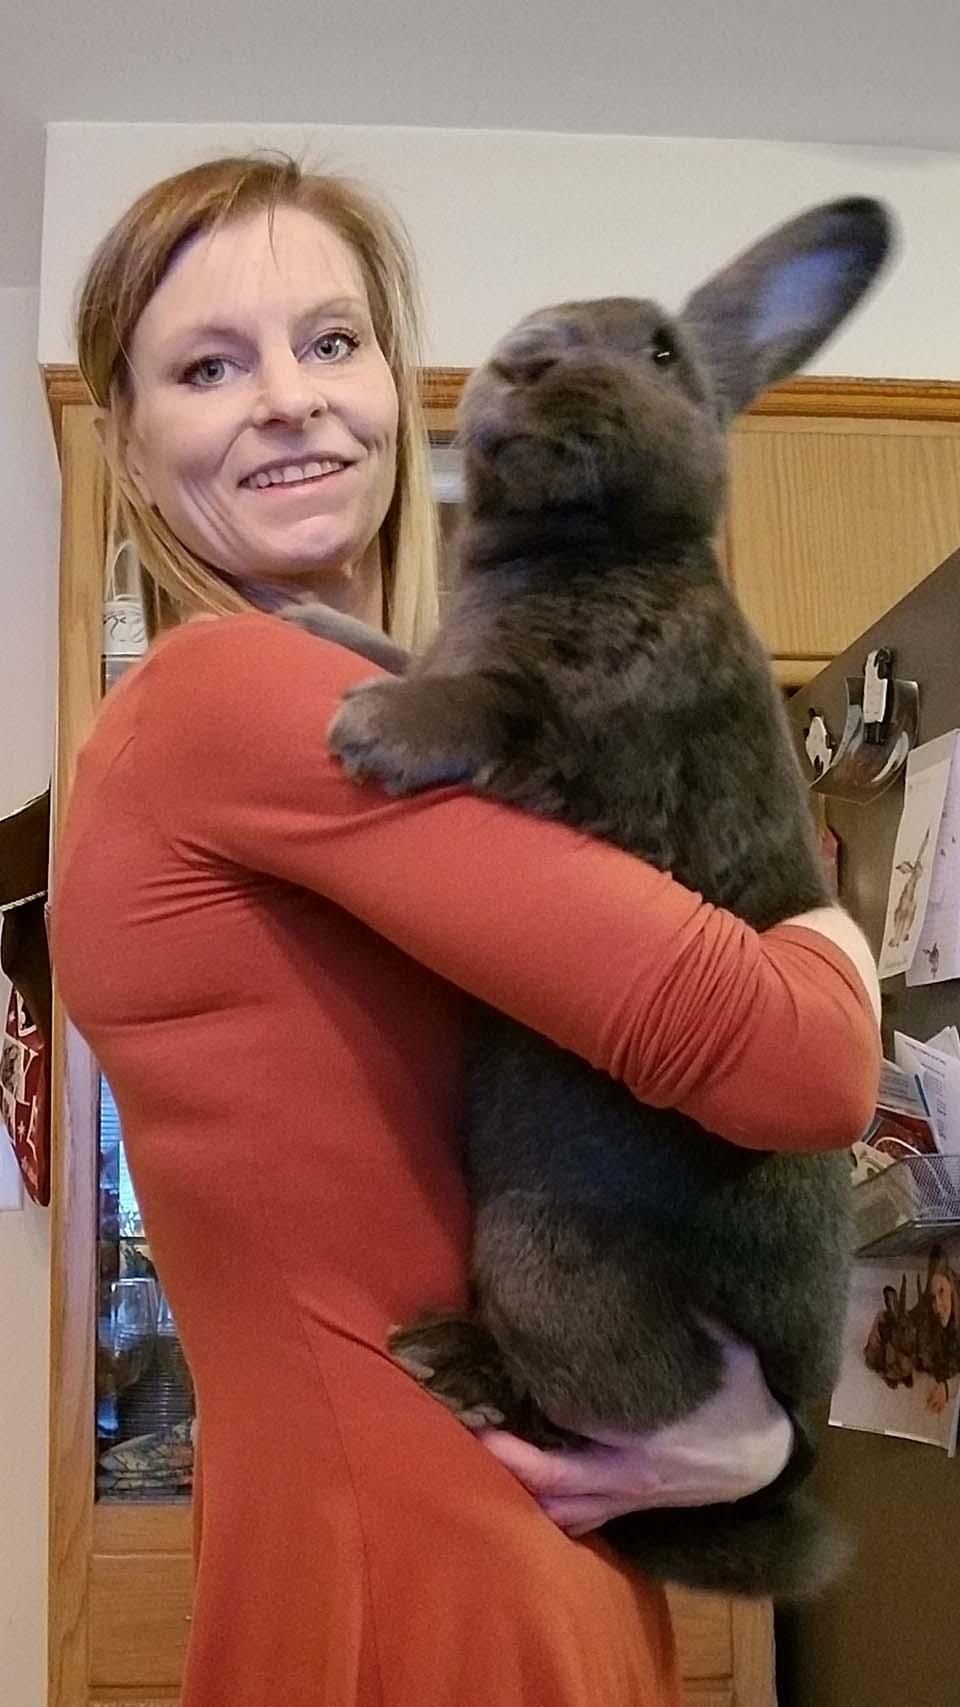 mujer carga a conejo gigante